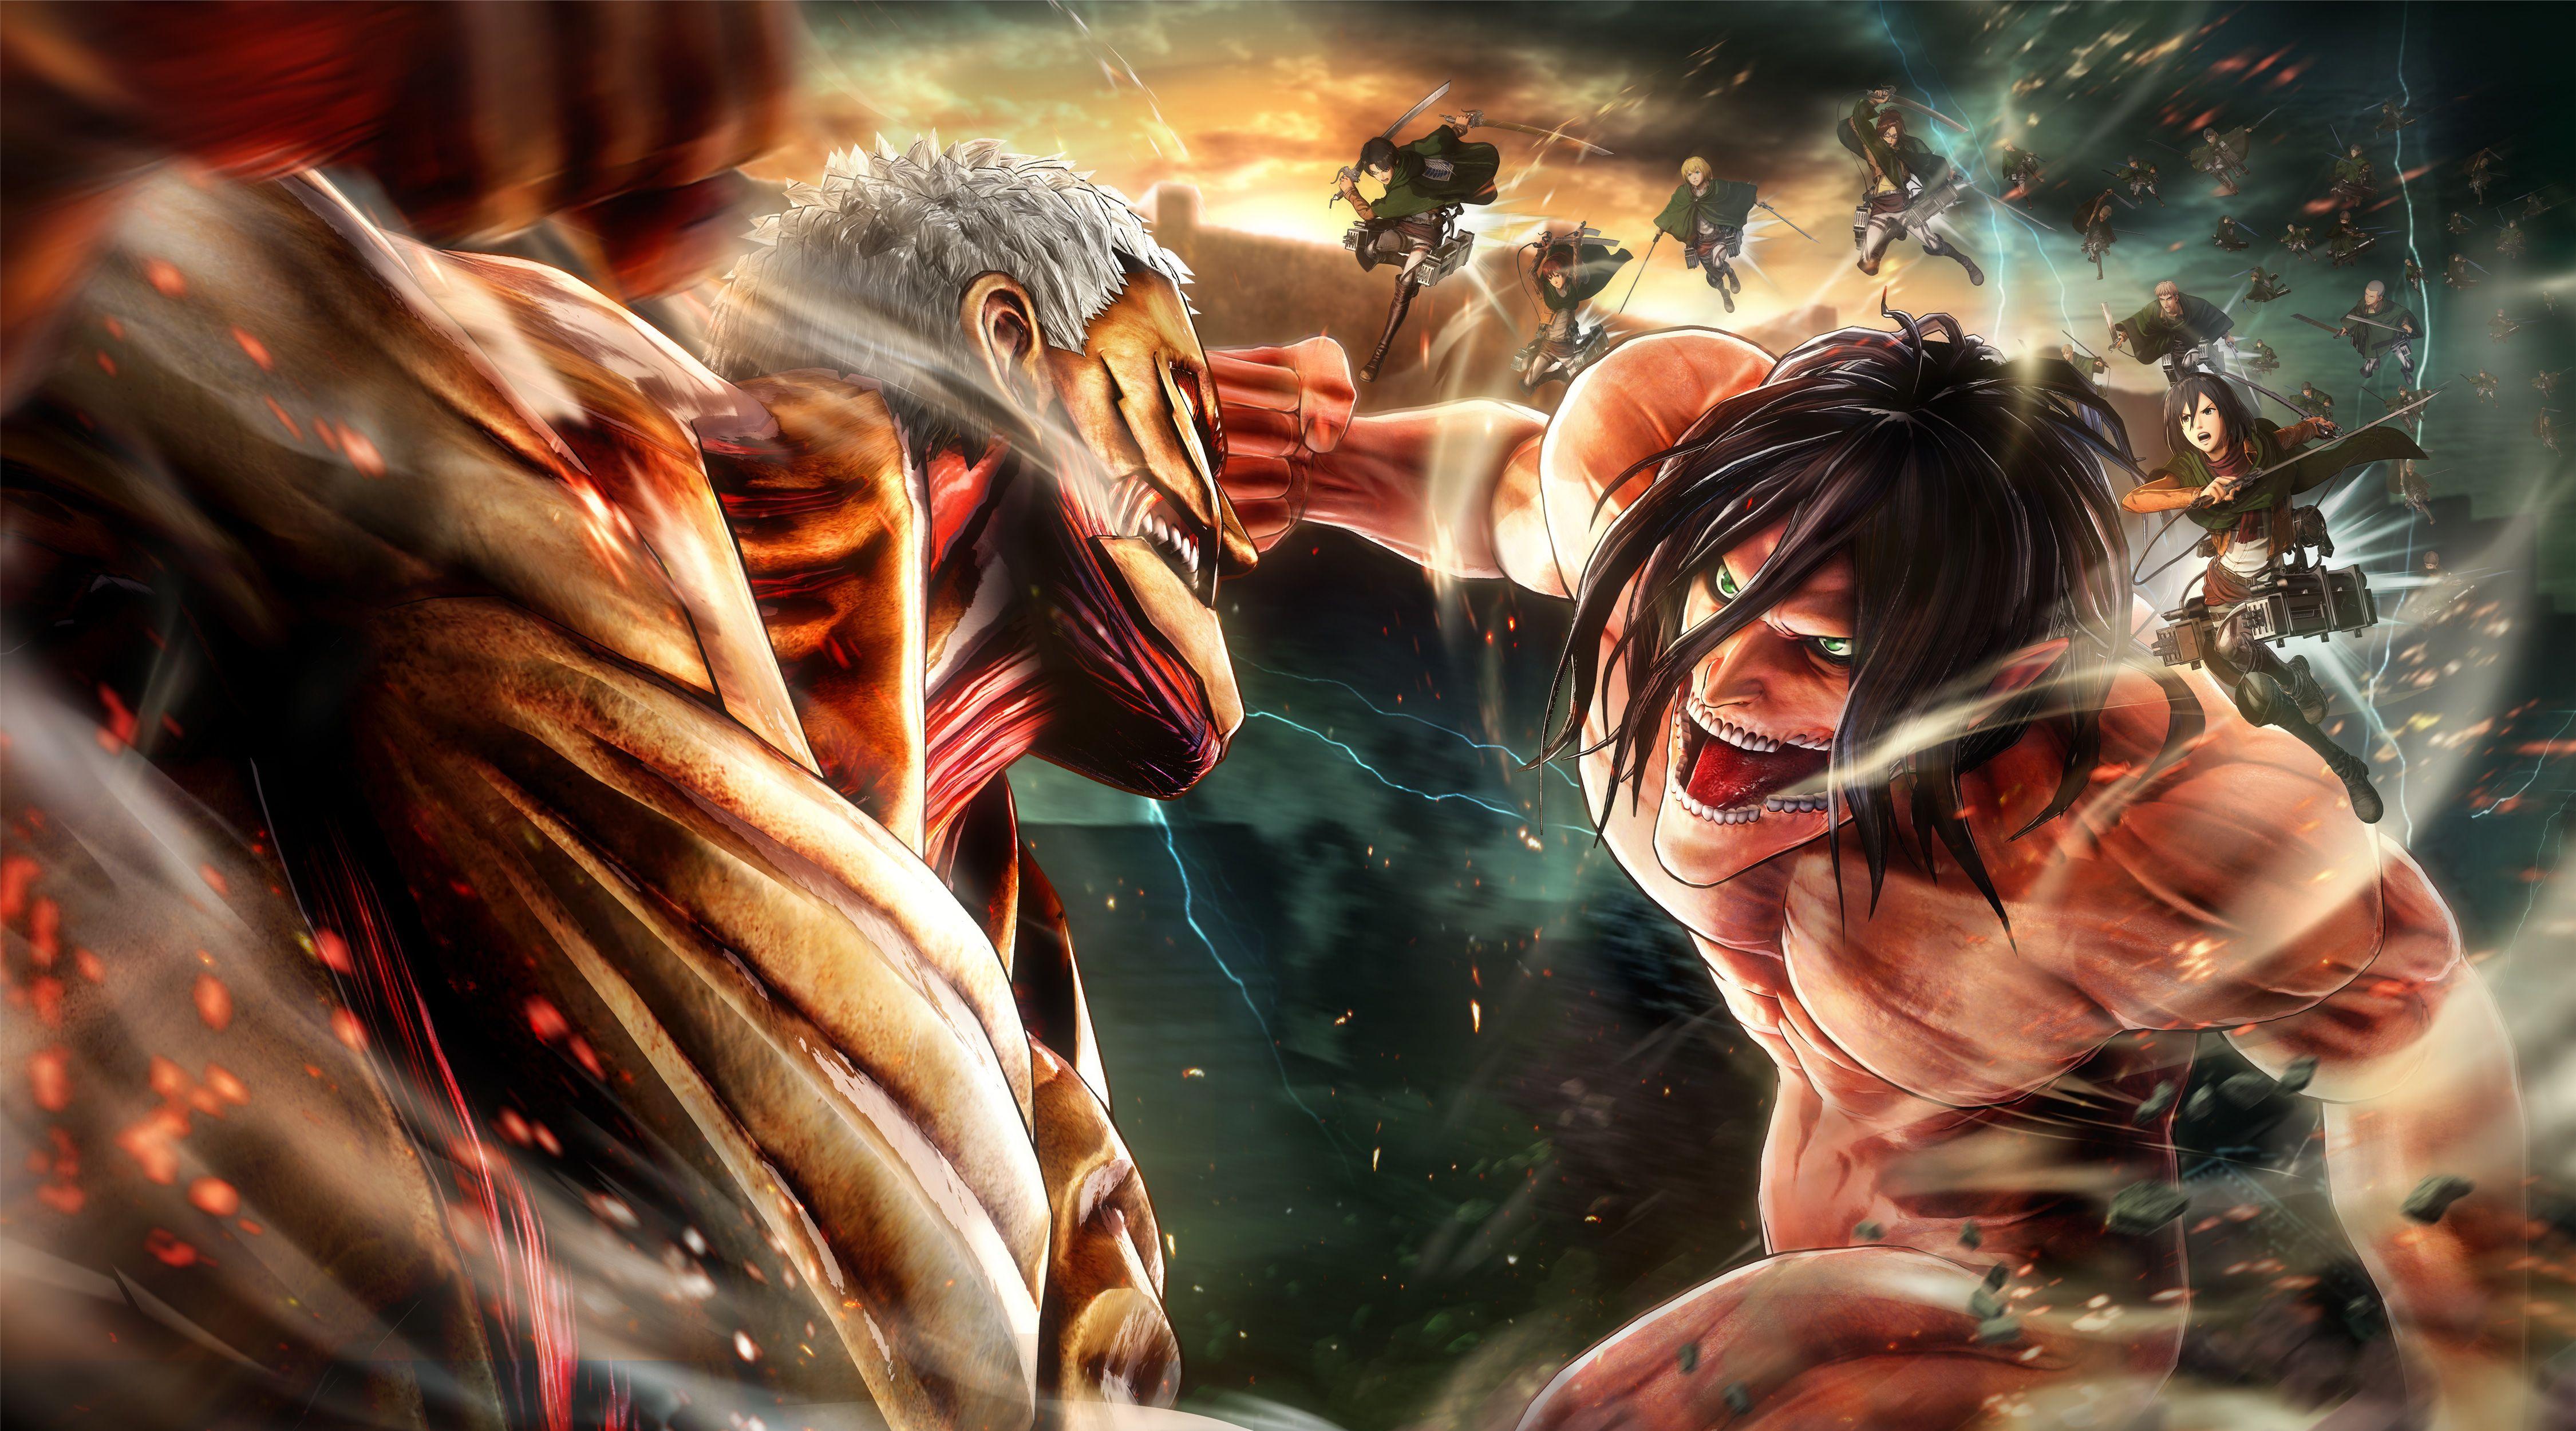 Attack On Titan Wallpaper 4k Anime Wallpaper in 2020